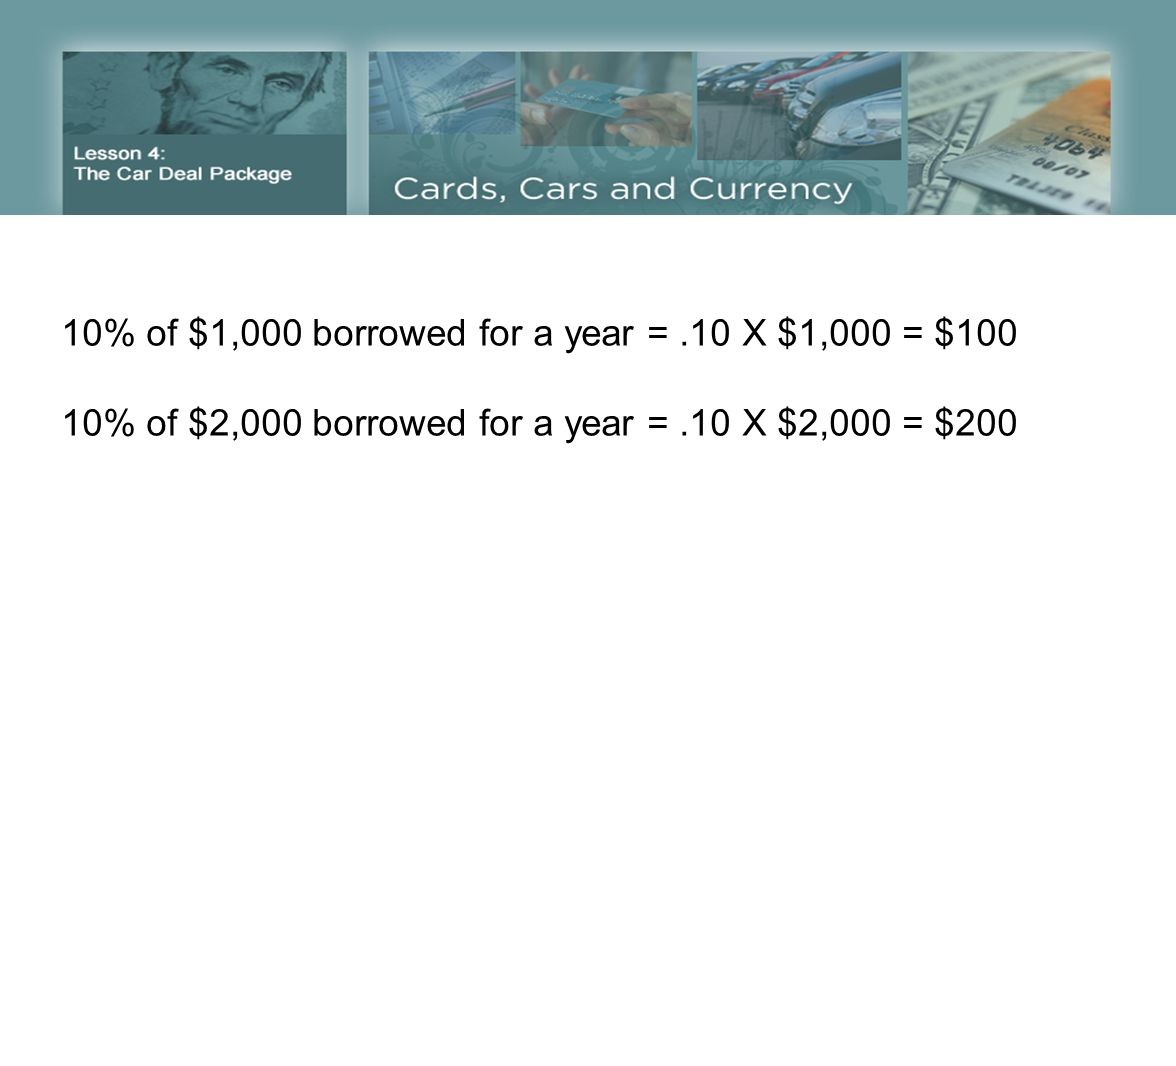 10% of $1,000 borrowed for a year =.10 X $1,000 = $100 10% of $2,000 borrowed for a year =.10 X $2,000 = $200